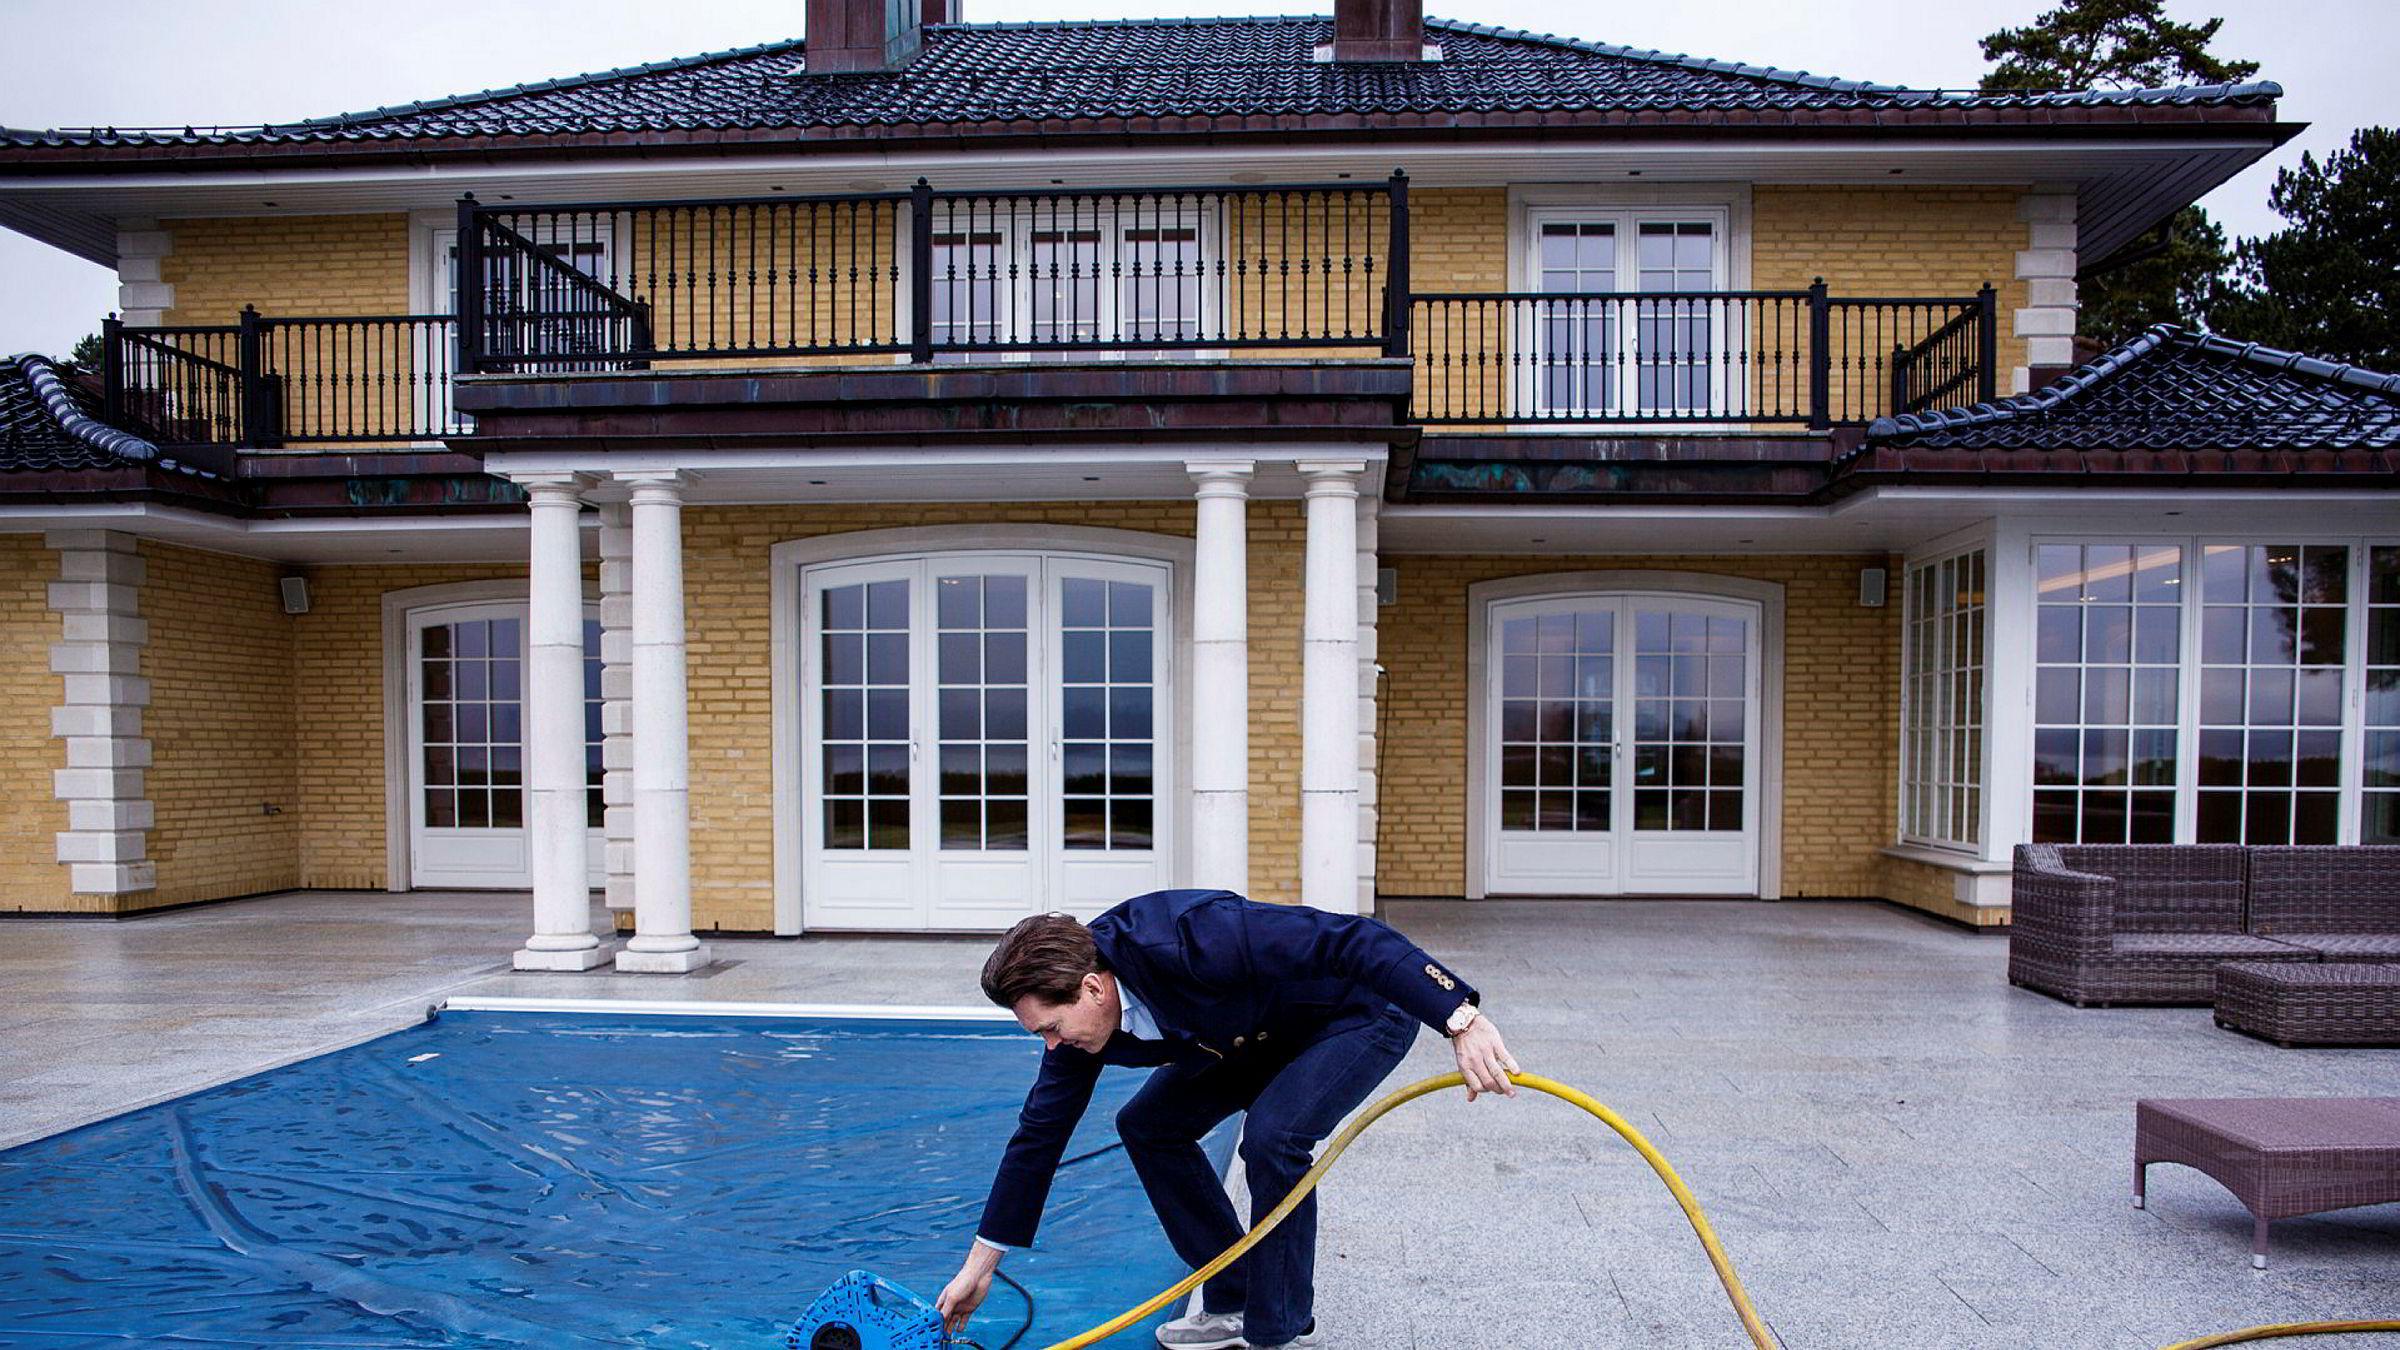 Investor Arne Fredly (på bildet) solgte selv sin egen villa for 86 millioner kroner til ekteparet Finn Ørjan Sæle og kona Hilde Rismyhr Sæle. «Grei handel for meg og en god handel for kjøper», ifølge Fredly.